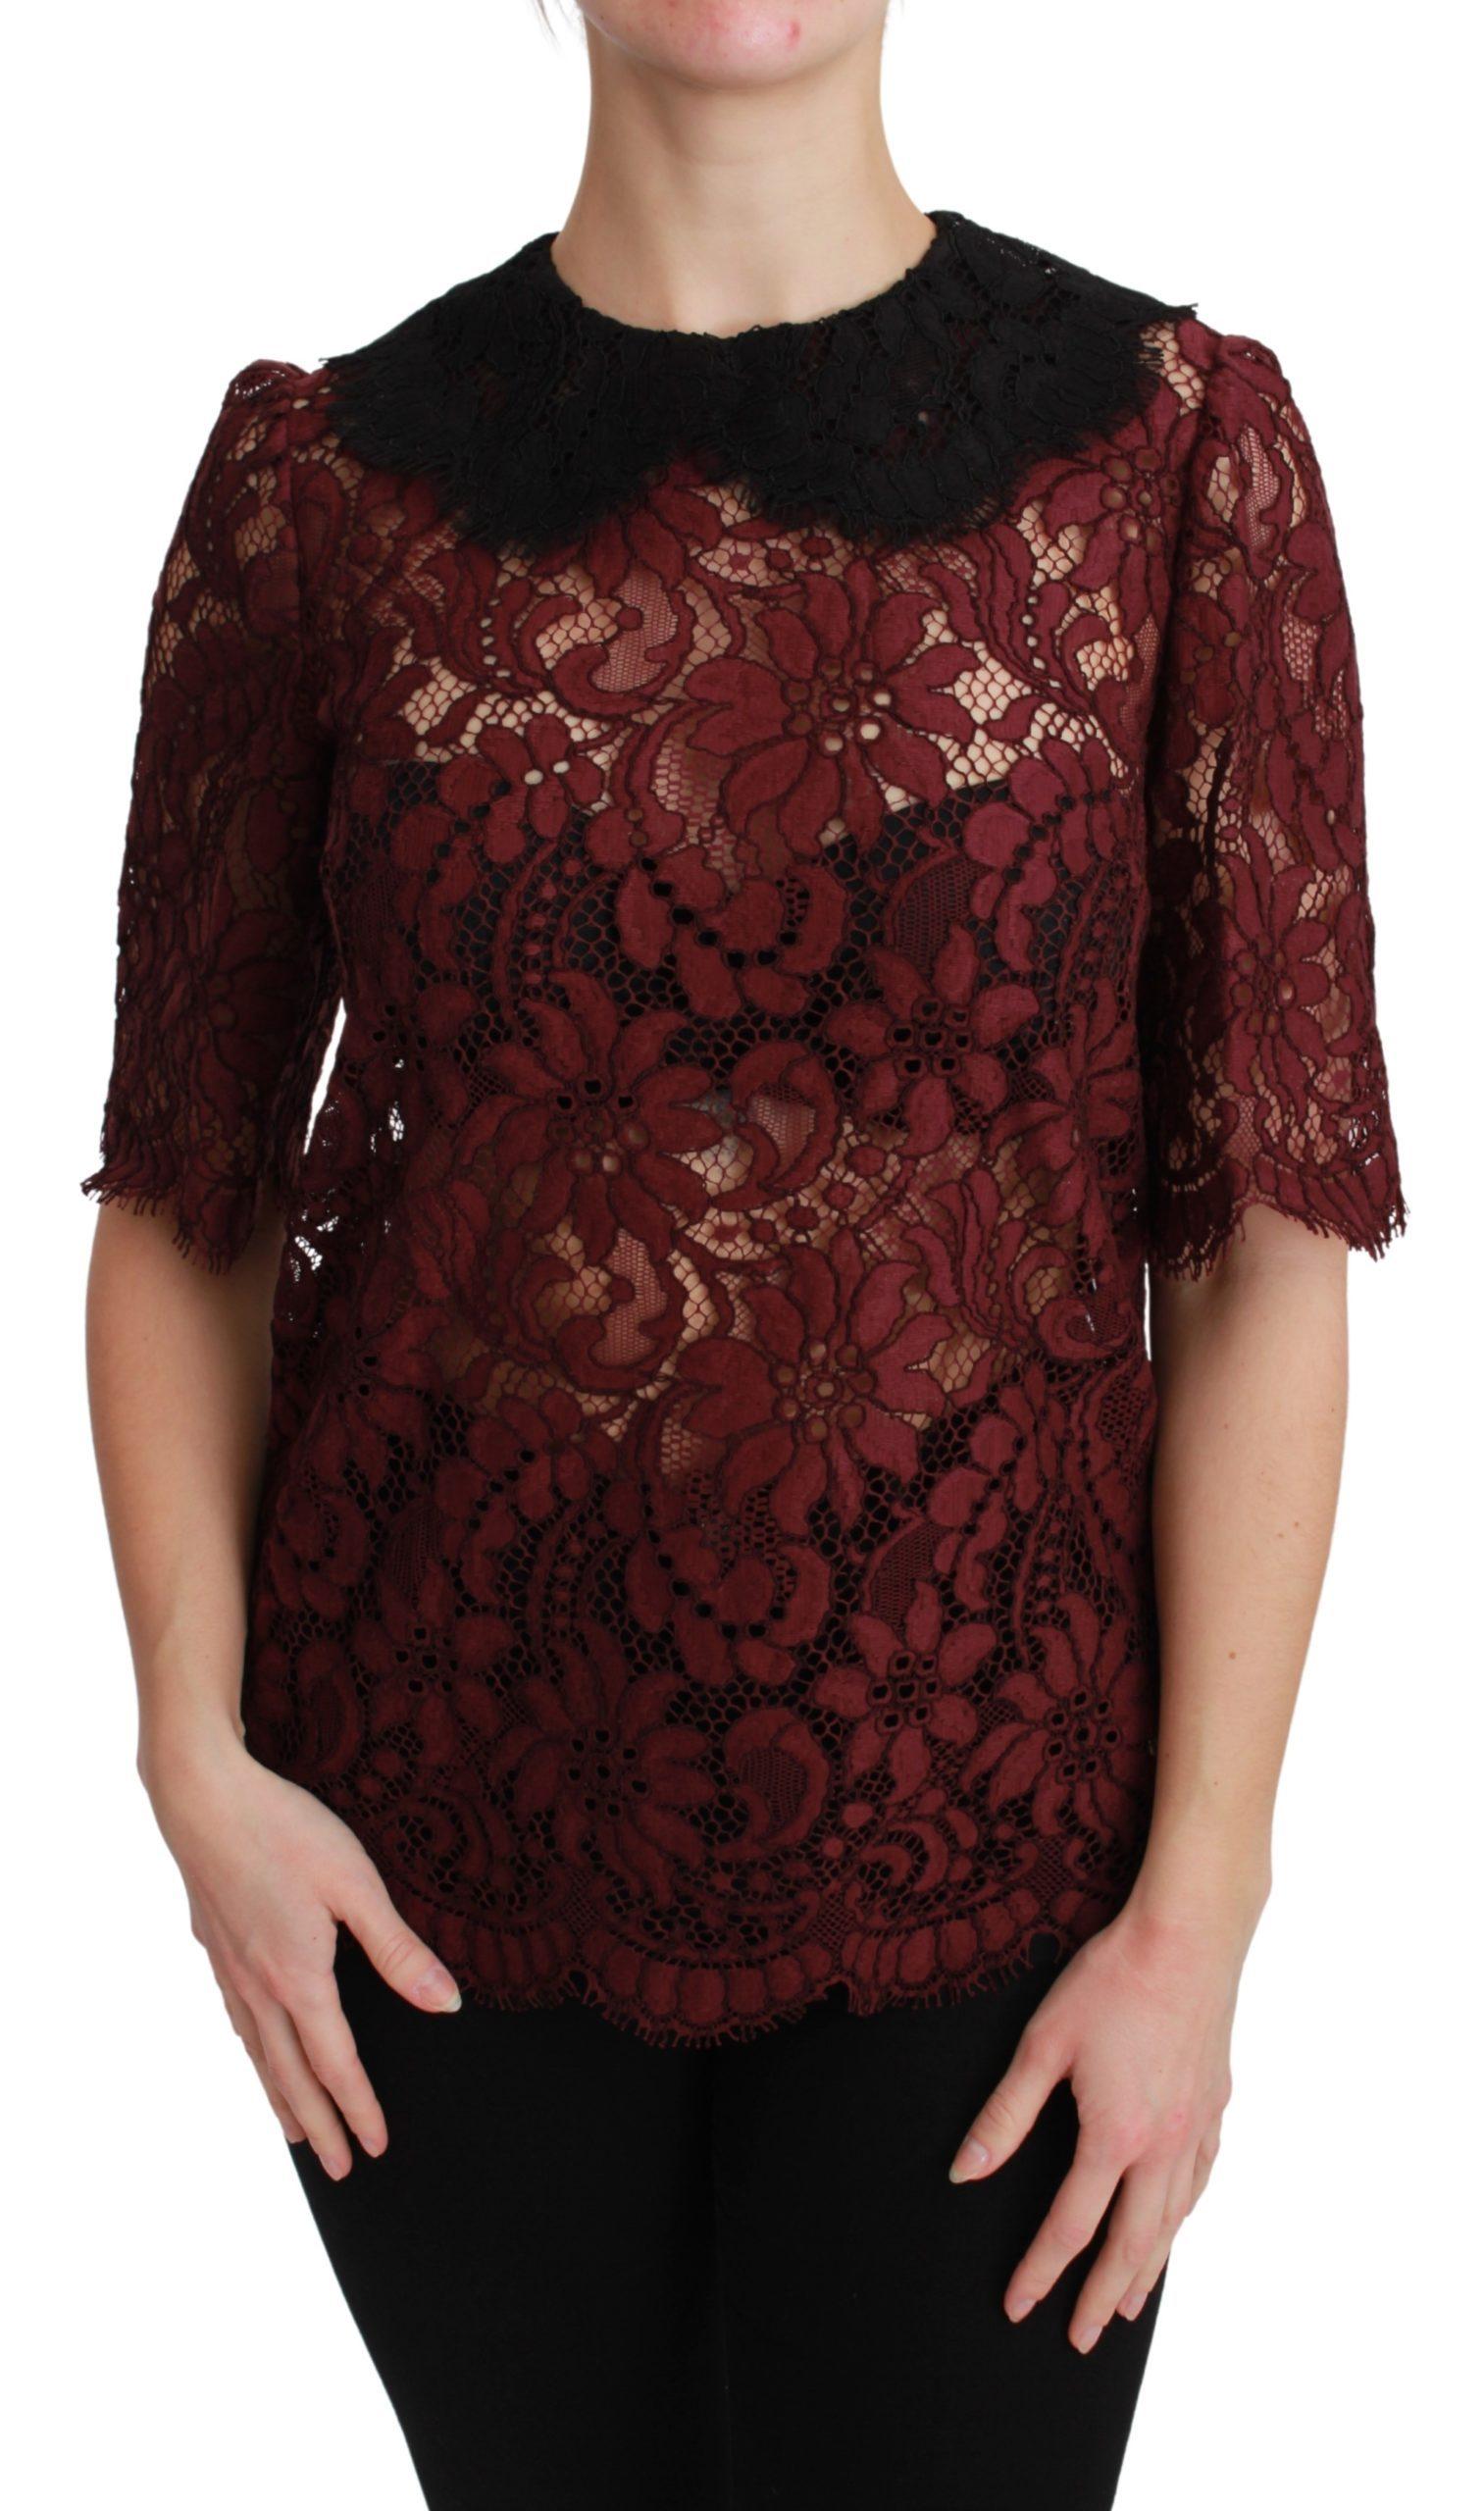 Dolce & Gabbana Women's Short Sleeve Top Maroon BGTSH2679 - IT42 M